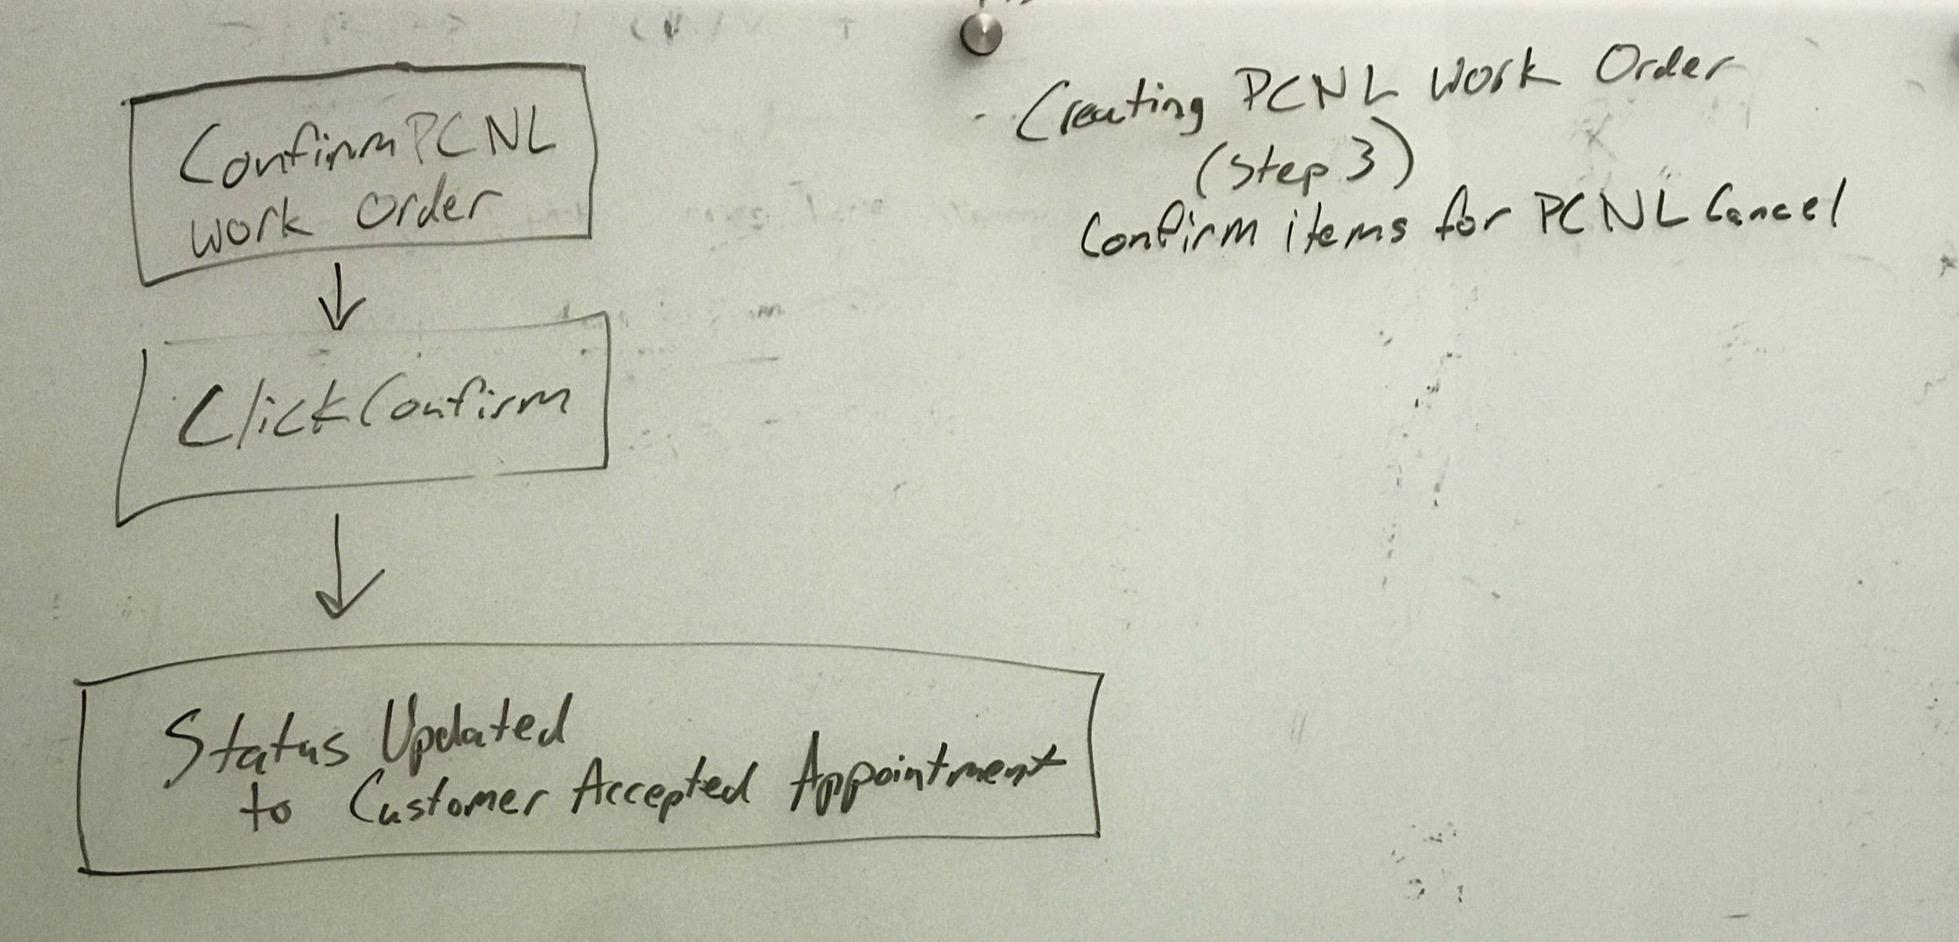 Creating PCNL Work Order (step 3)